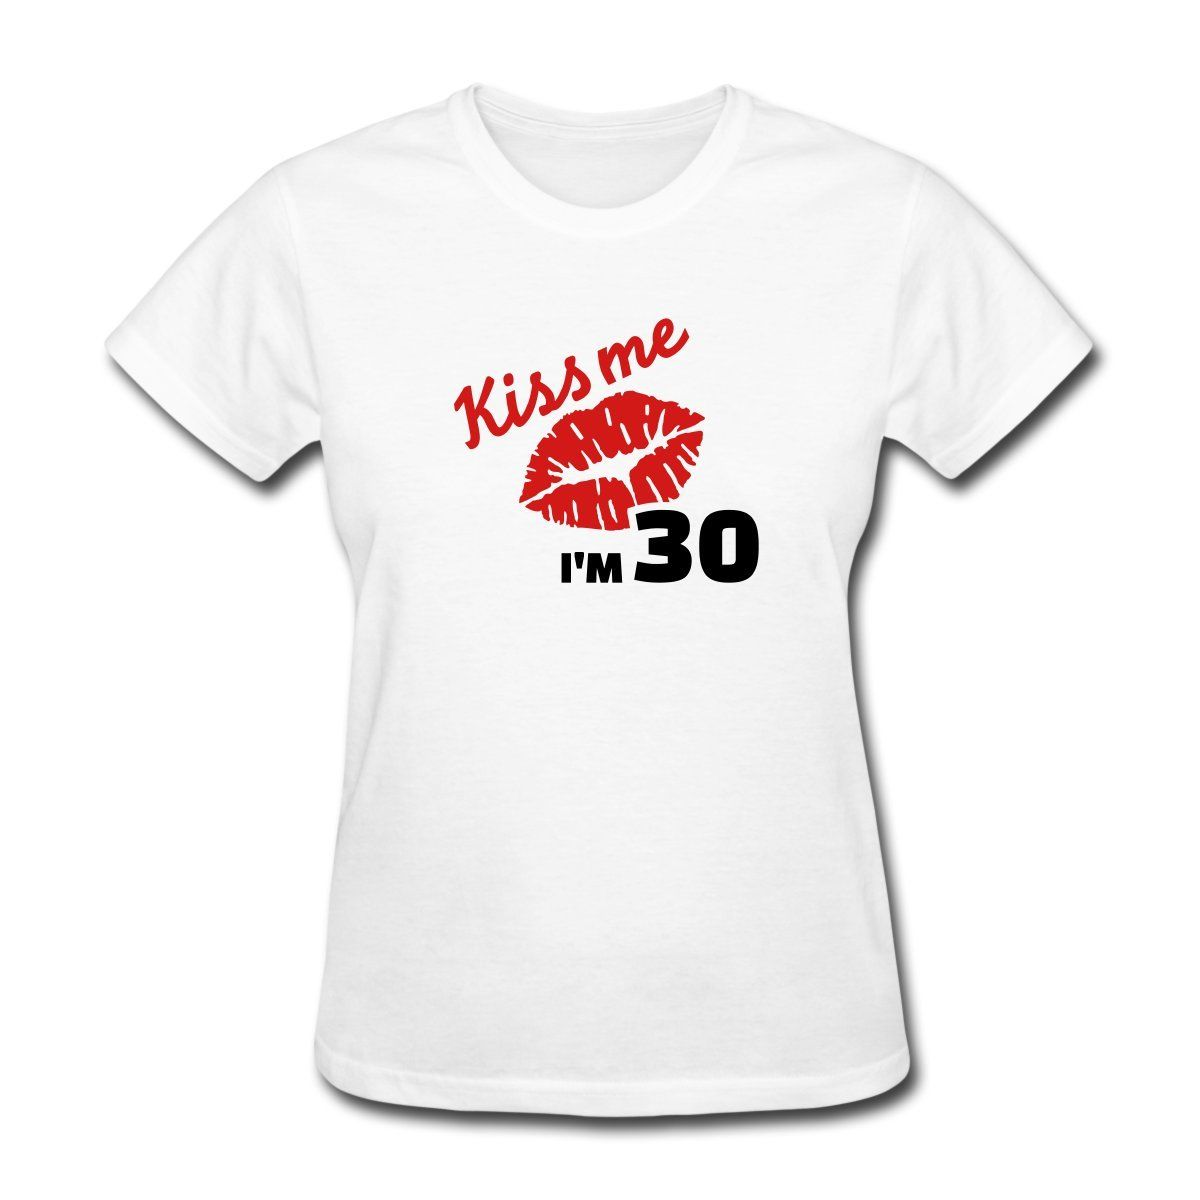 Shirt design images - Birthday Kiss Me I M 30 Women S T Shirt Design T Shirt Novelty Tops